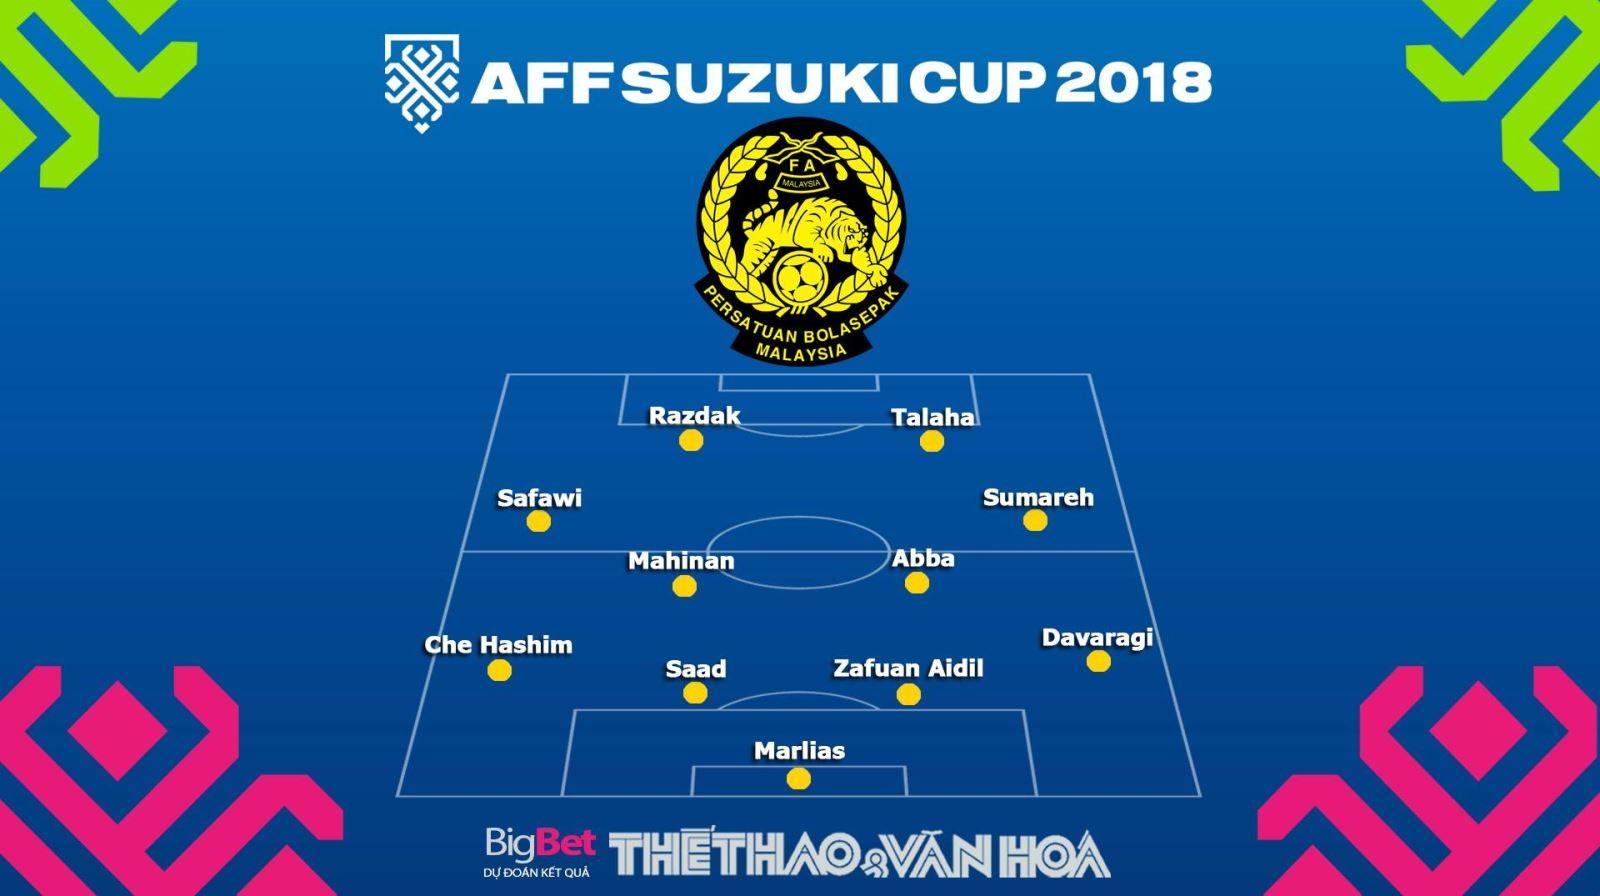 Malaysia vs Việt Nam, Việt Nam vs Malaysia, Mã Lai vs Thái, Thái vs Mã Lai, Malaysia, Việt Nam, Mã Lai, Thái, đội tuyển Malaysia, đội tuyển Việt Nam.